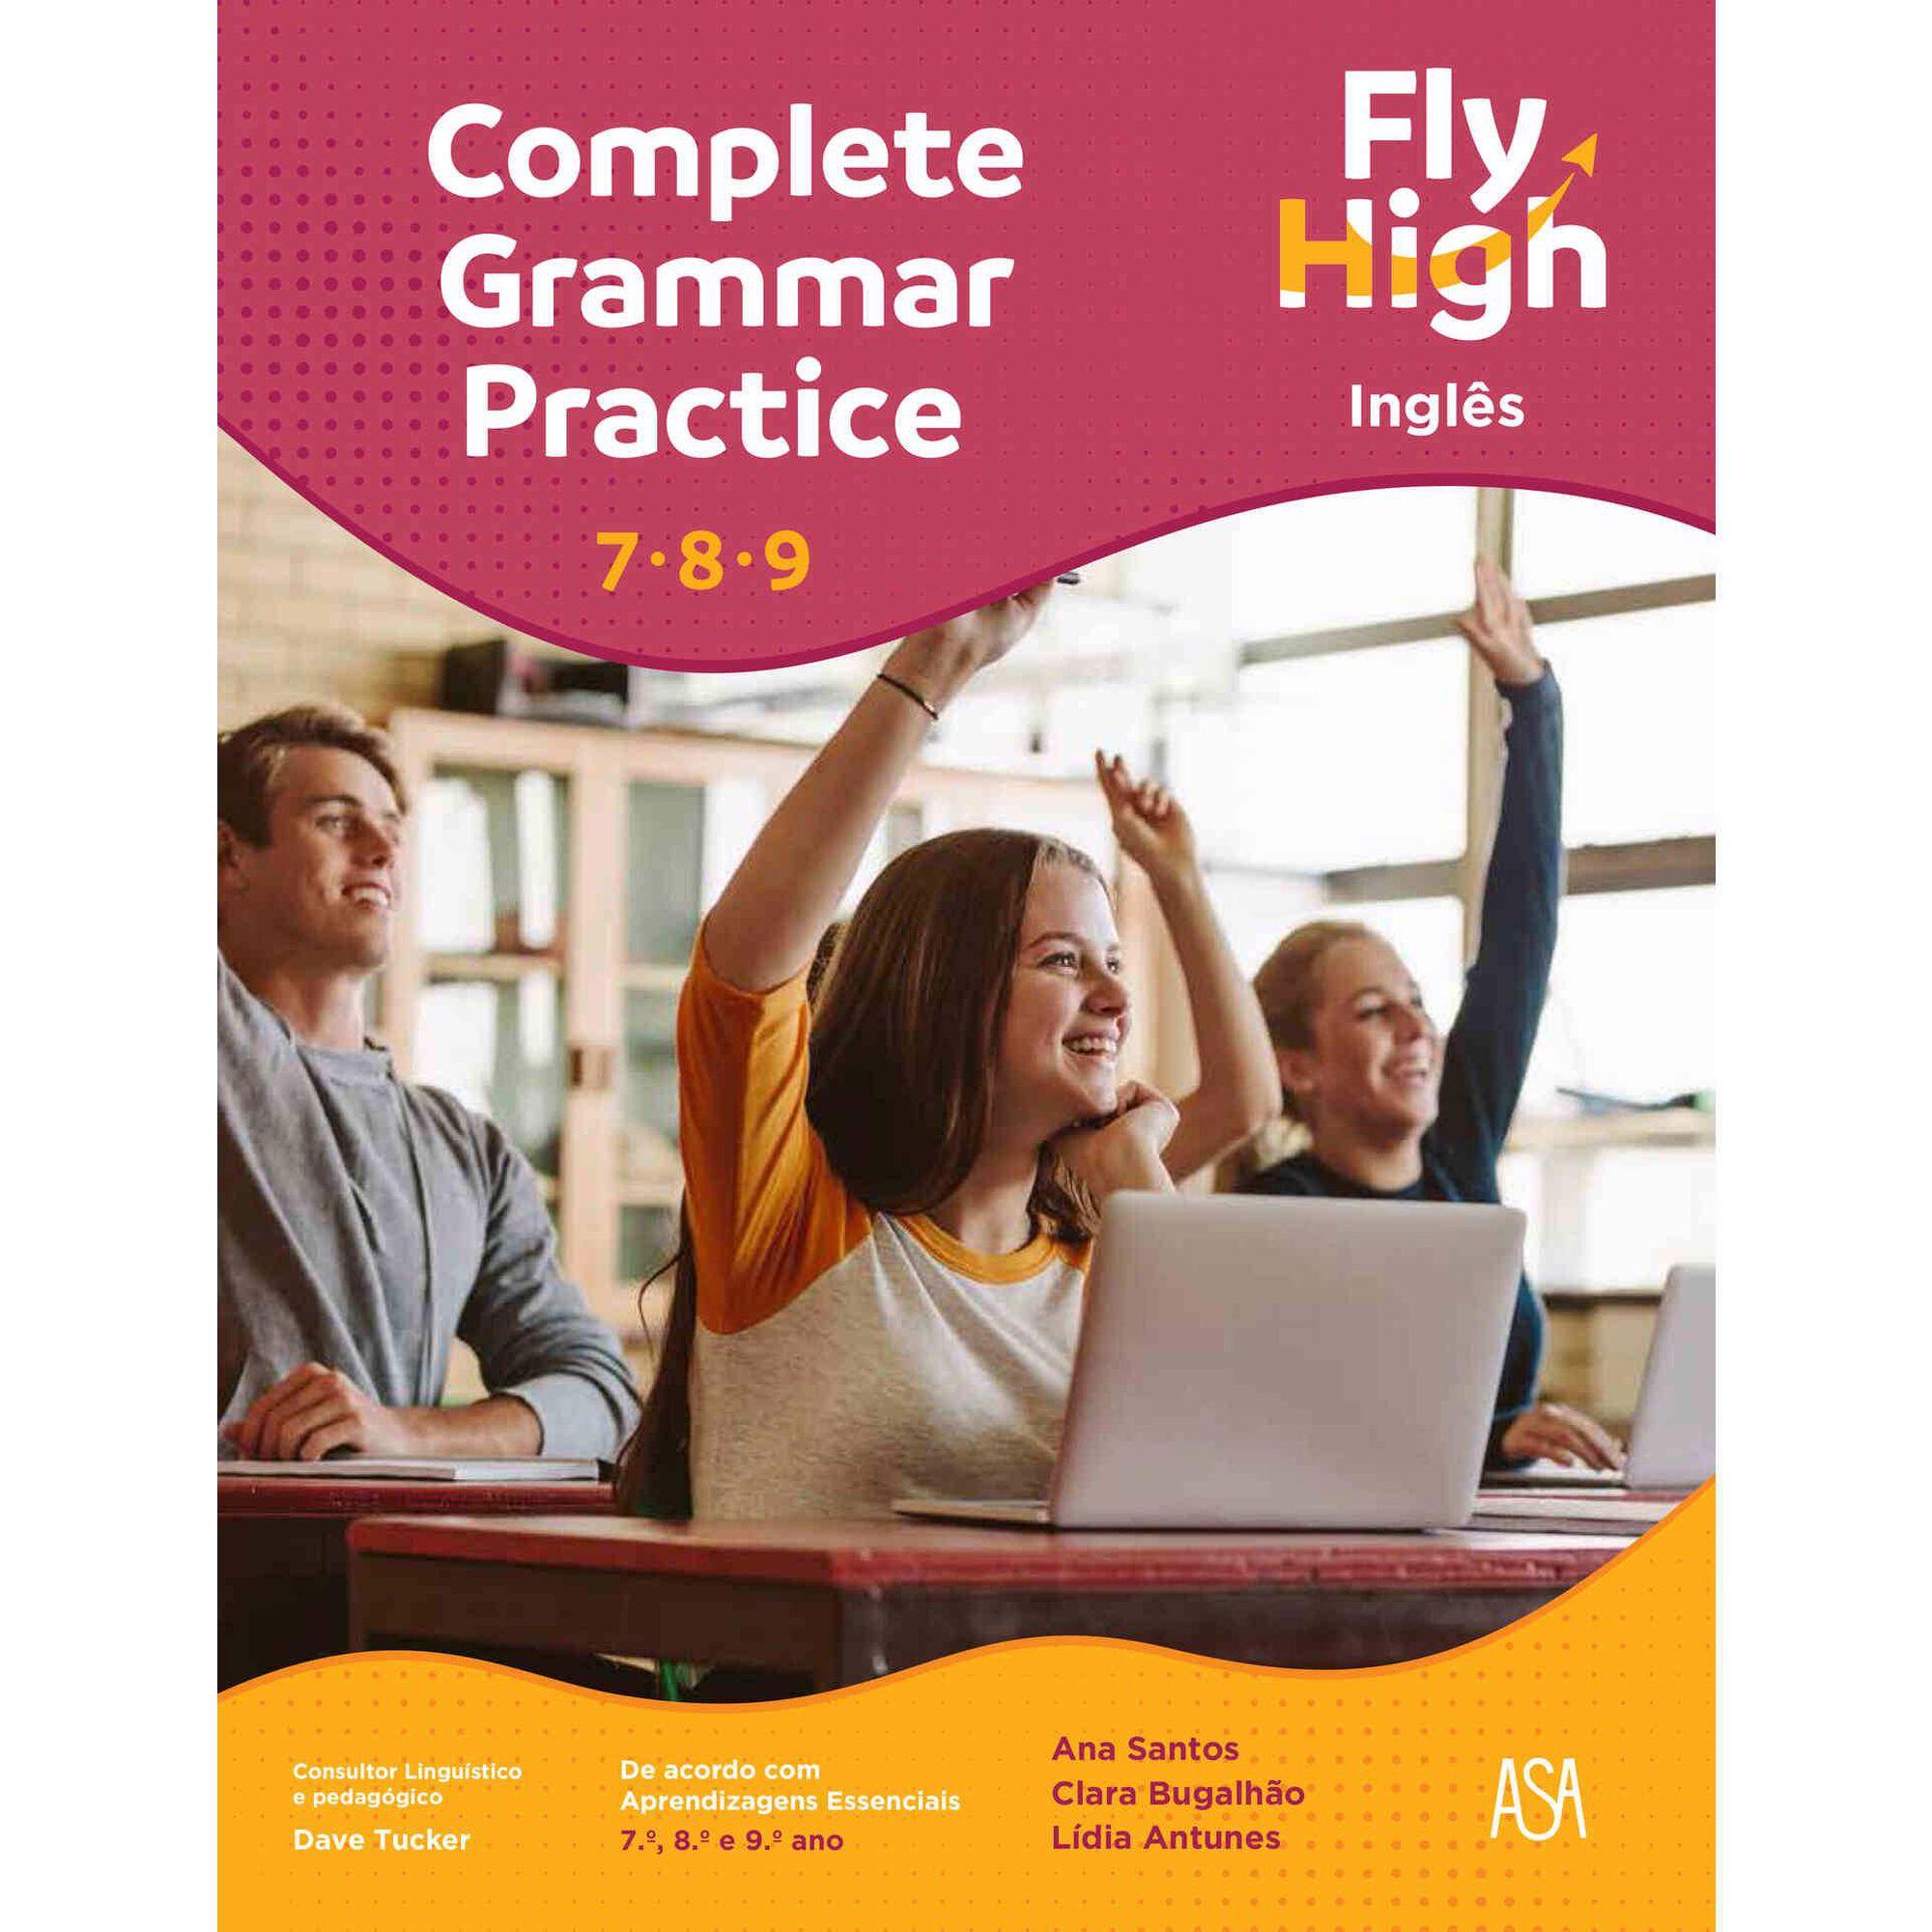 Complete Grammar Practice - Inglês - 7º, 8º e 9º Ano